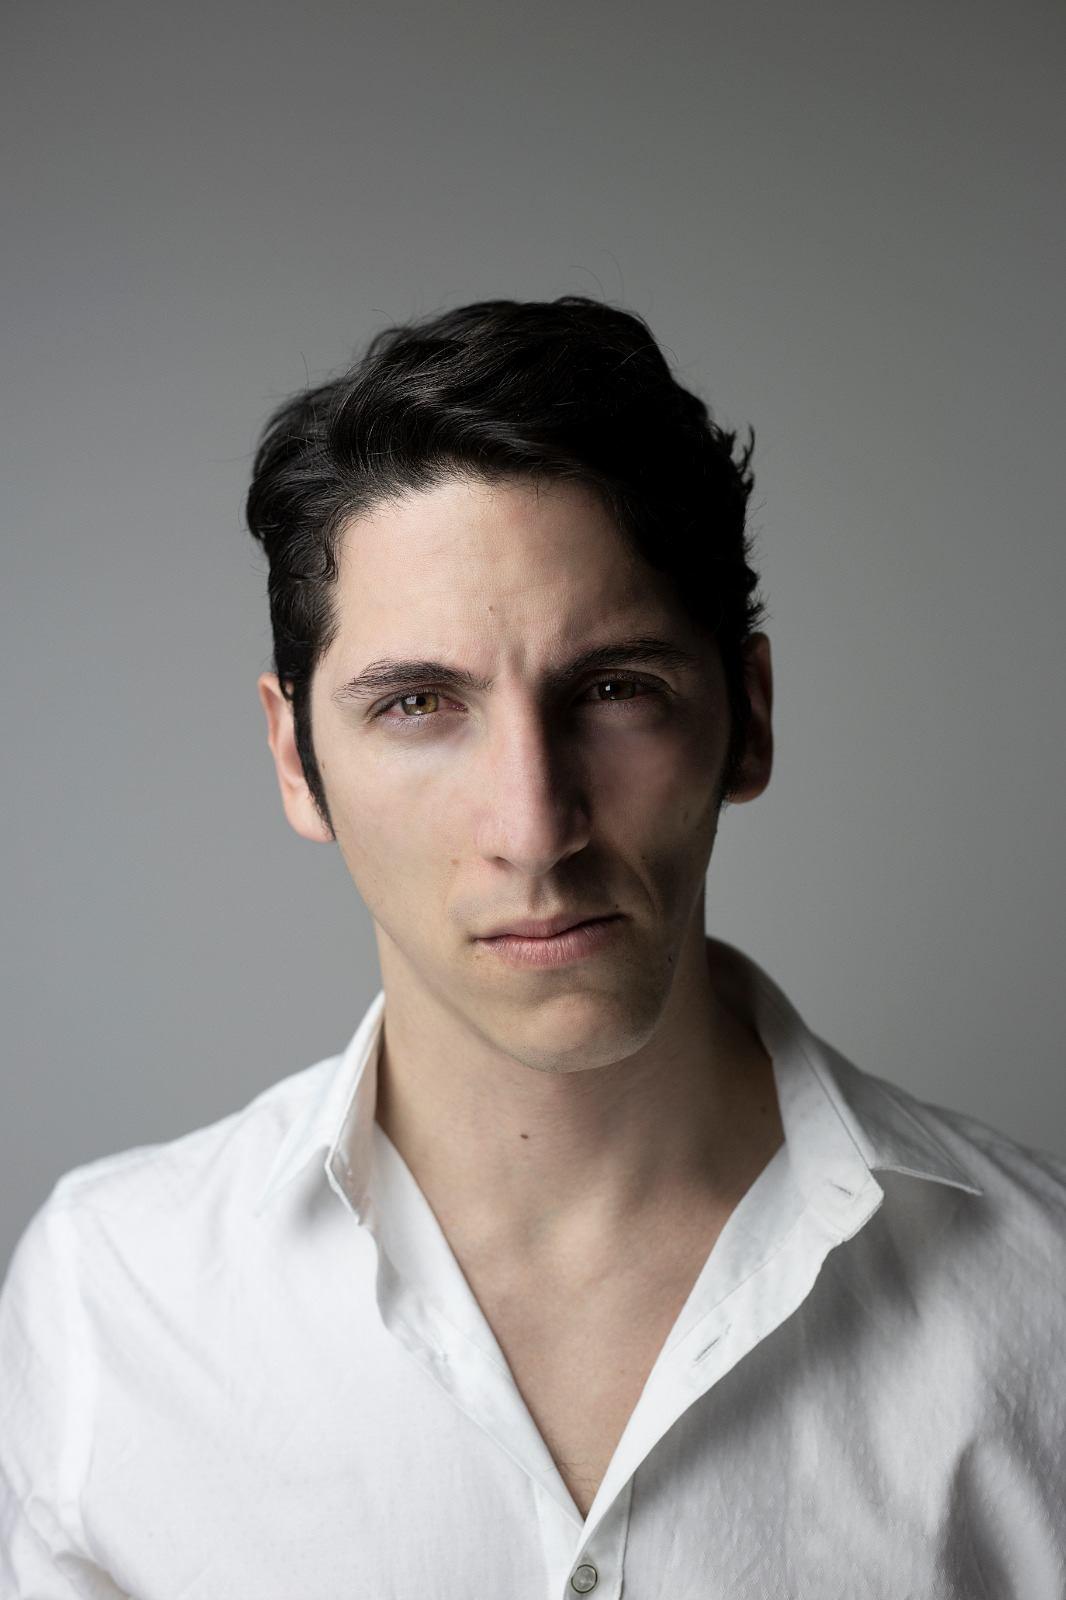 Giorgio Schiro